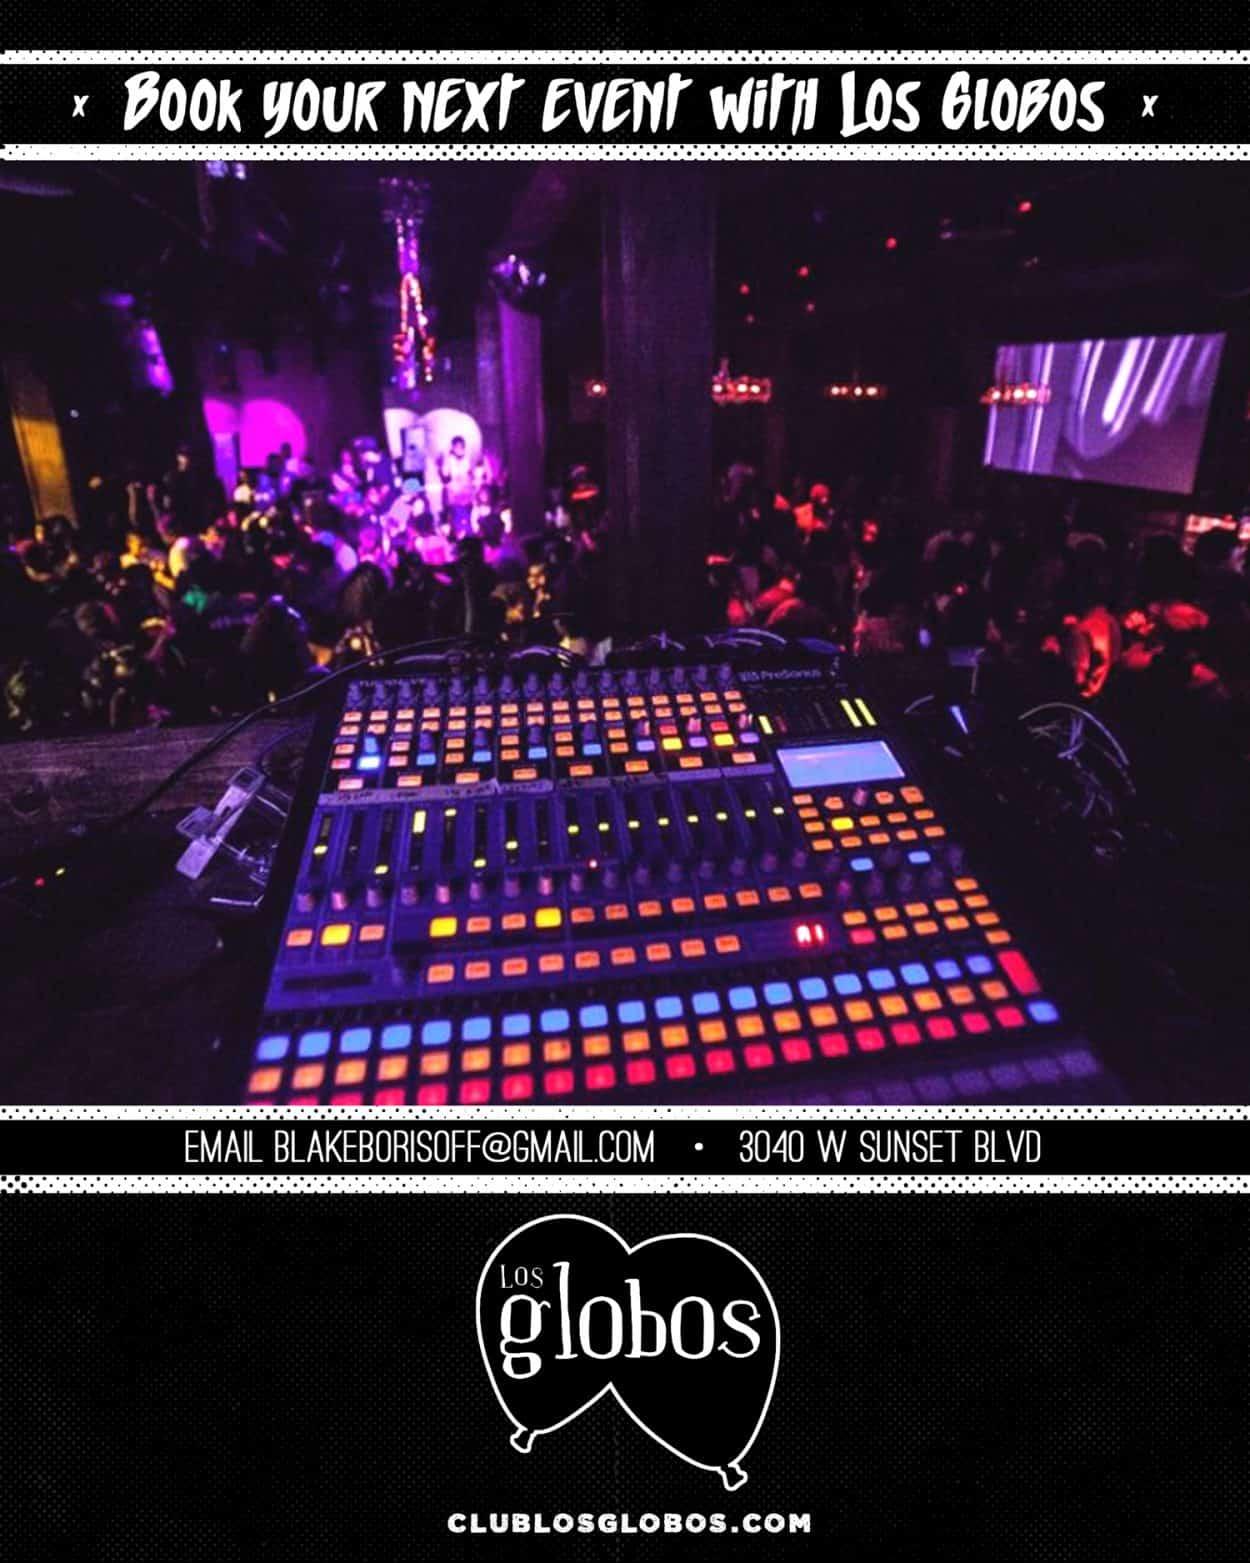 los globos - instagram ads